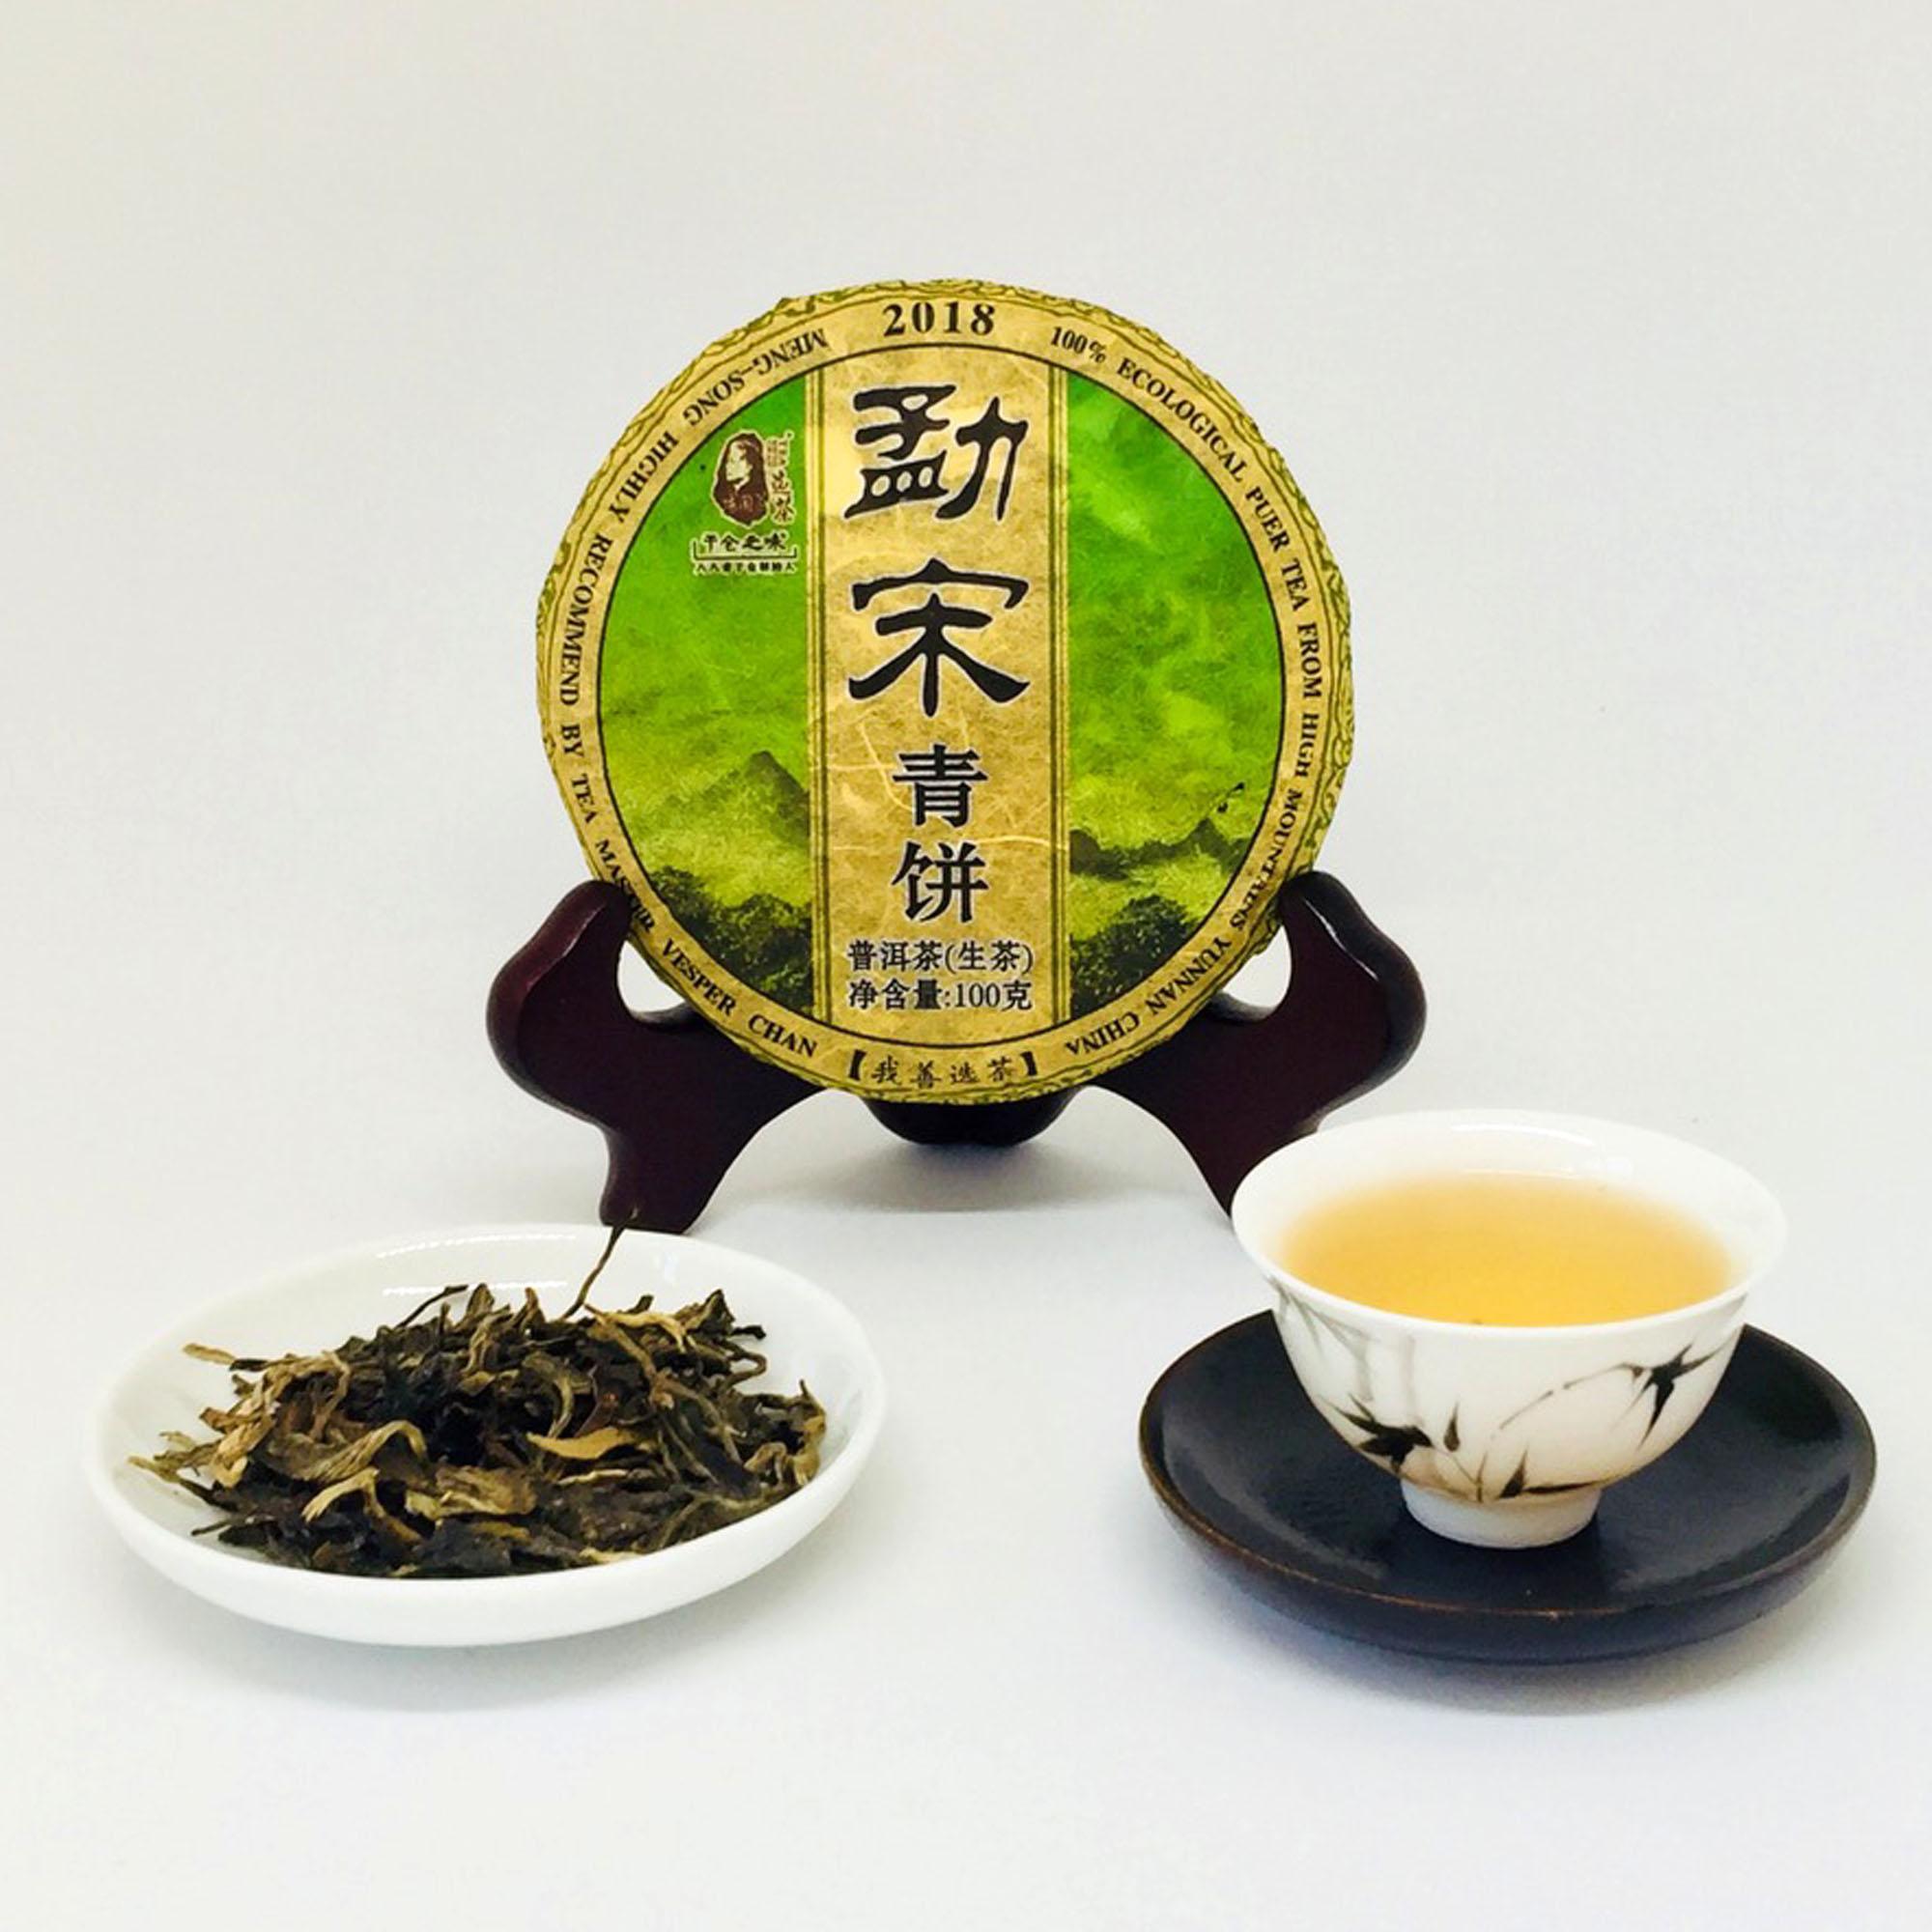 Mengsong Spring Raw Pu-erh Tea